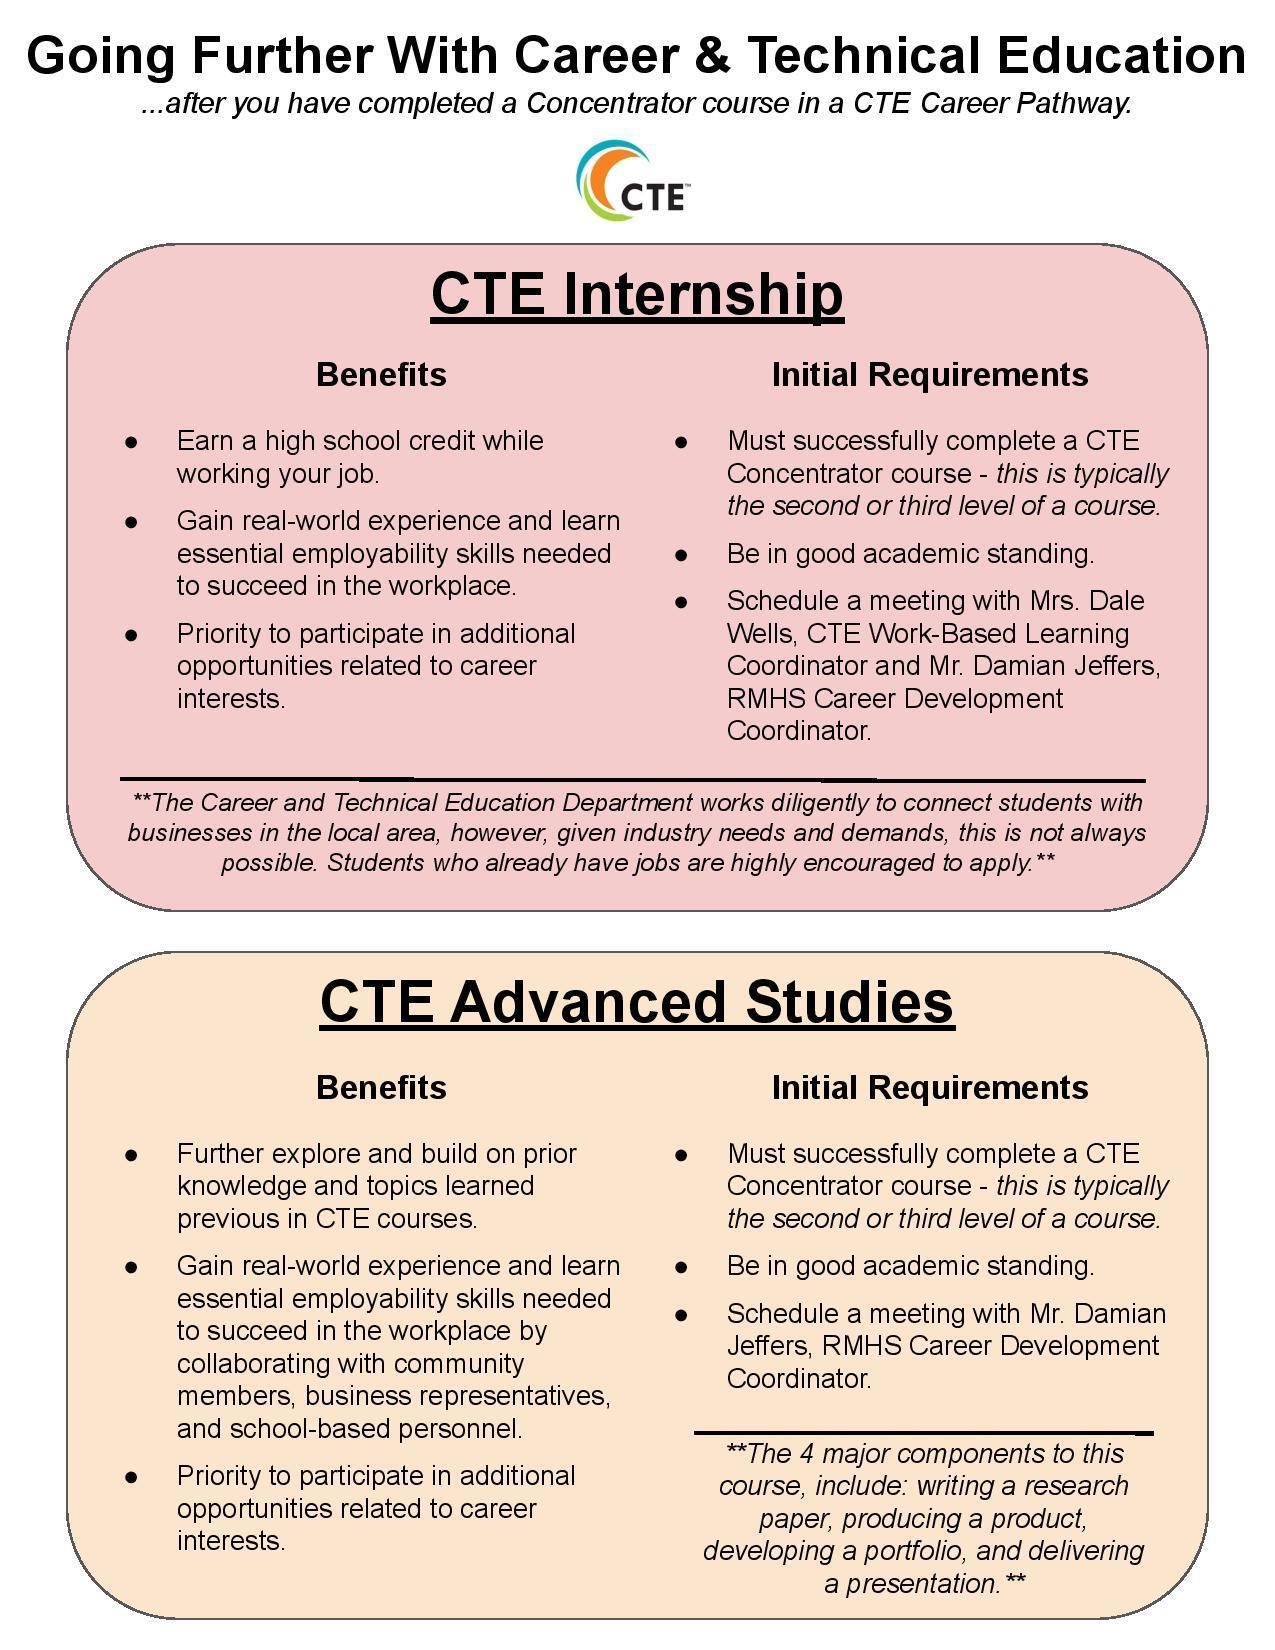 CTE Internship & Advanced Studies Information